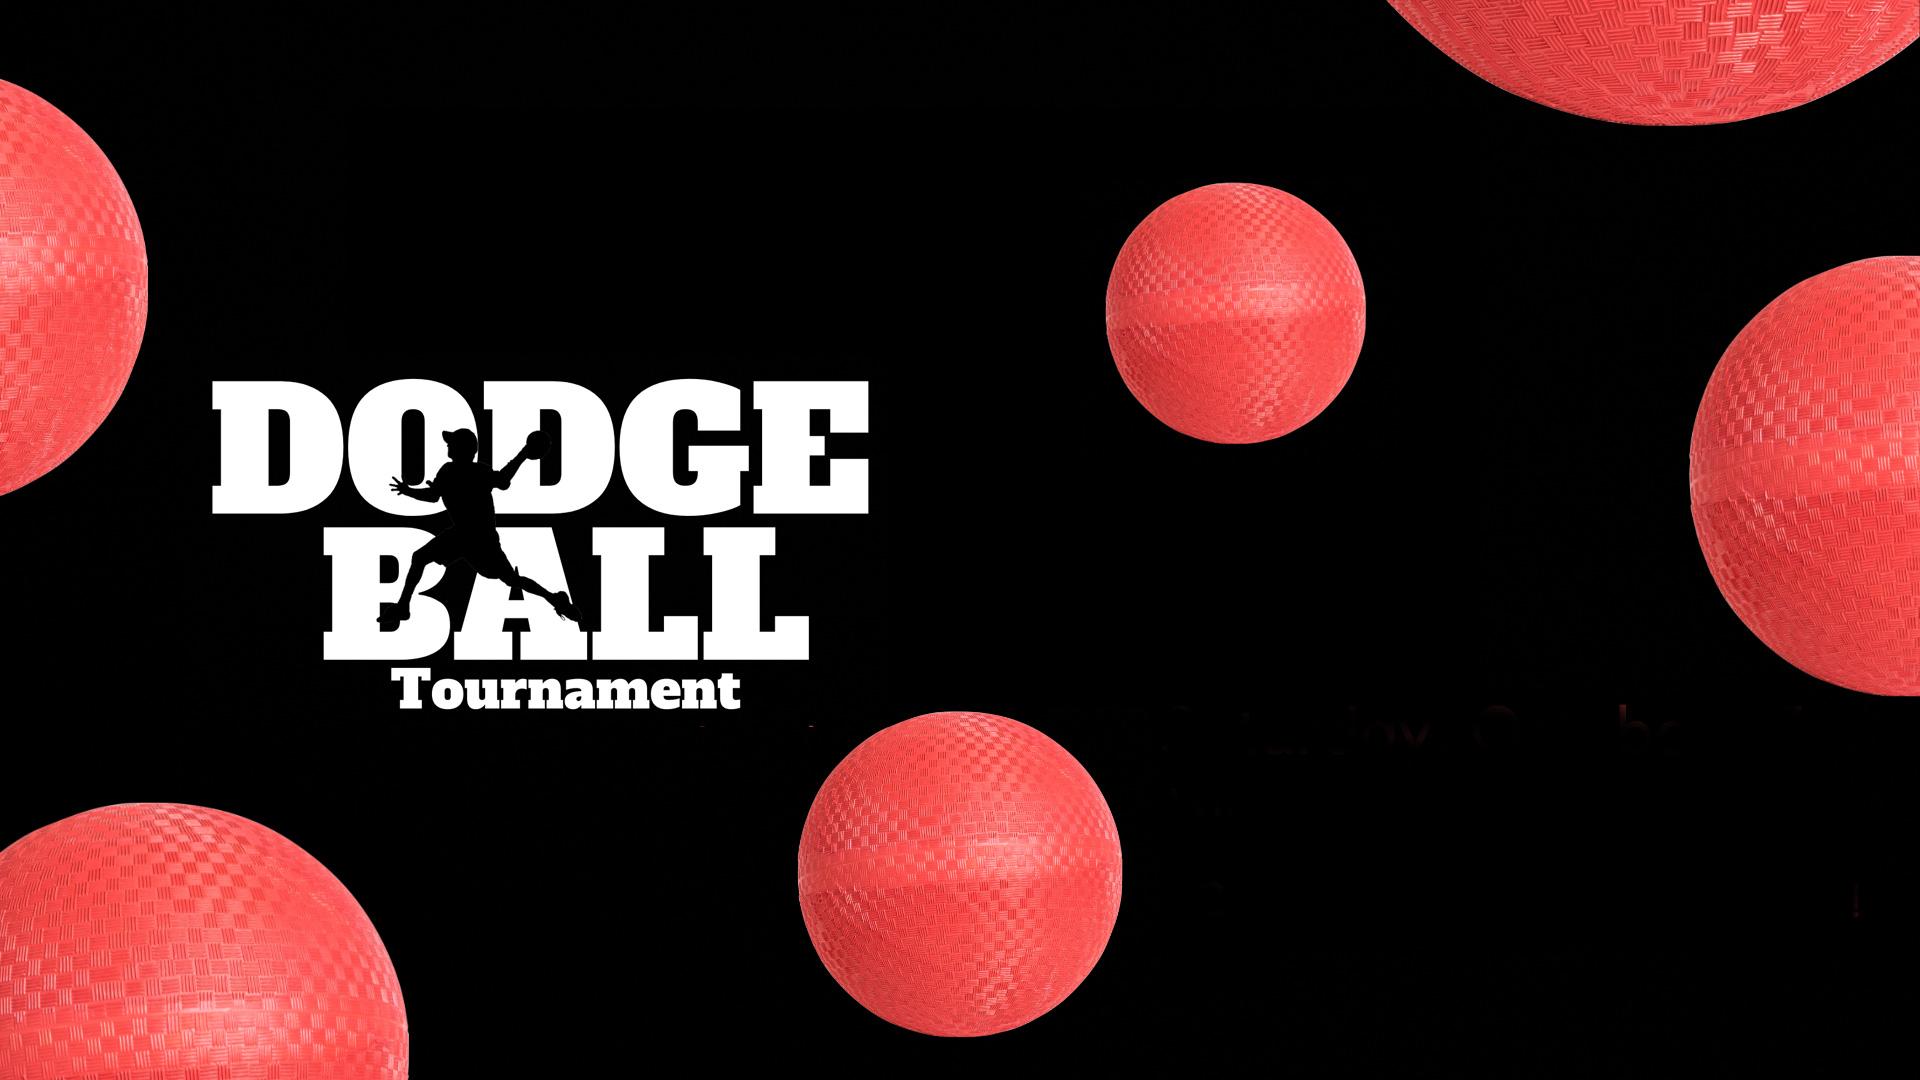 Image: Dodge Ball Tournament